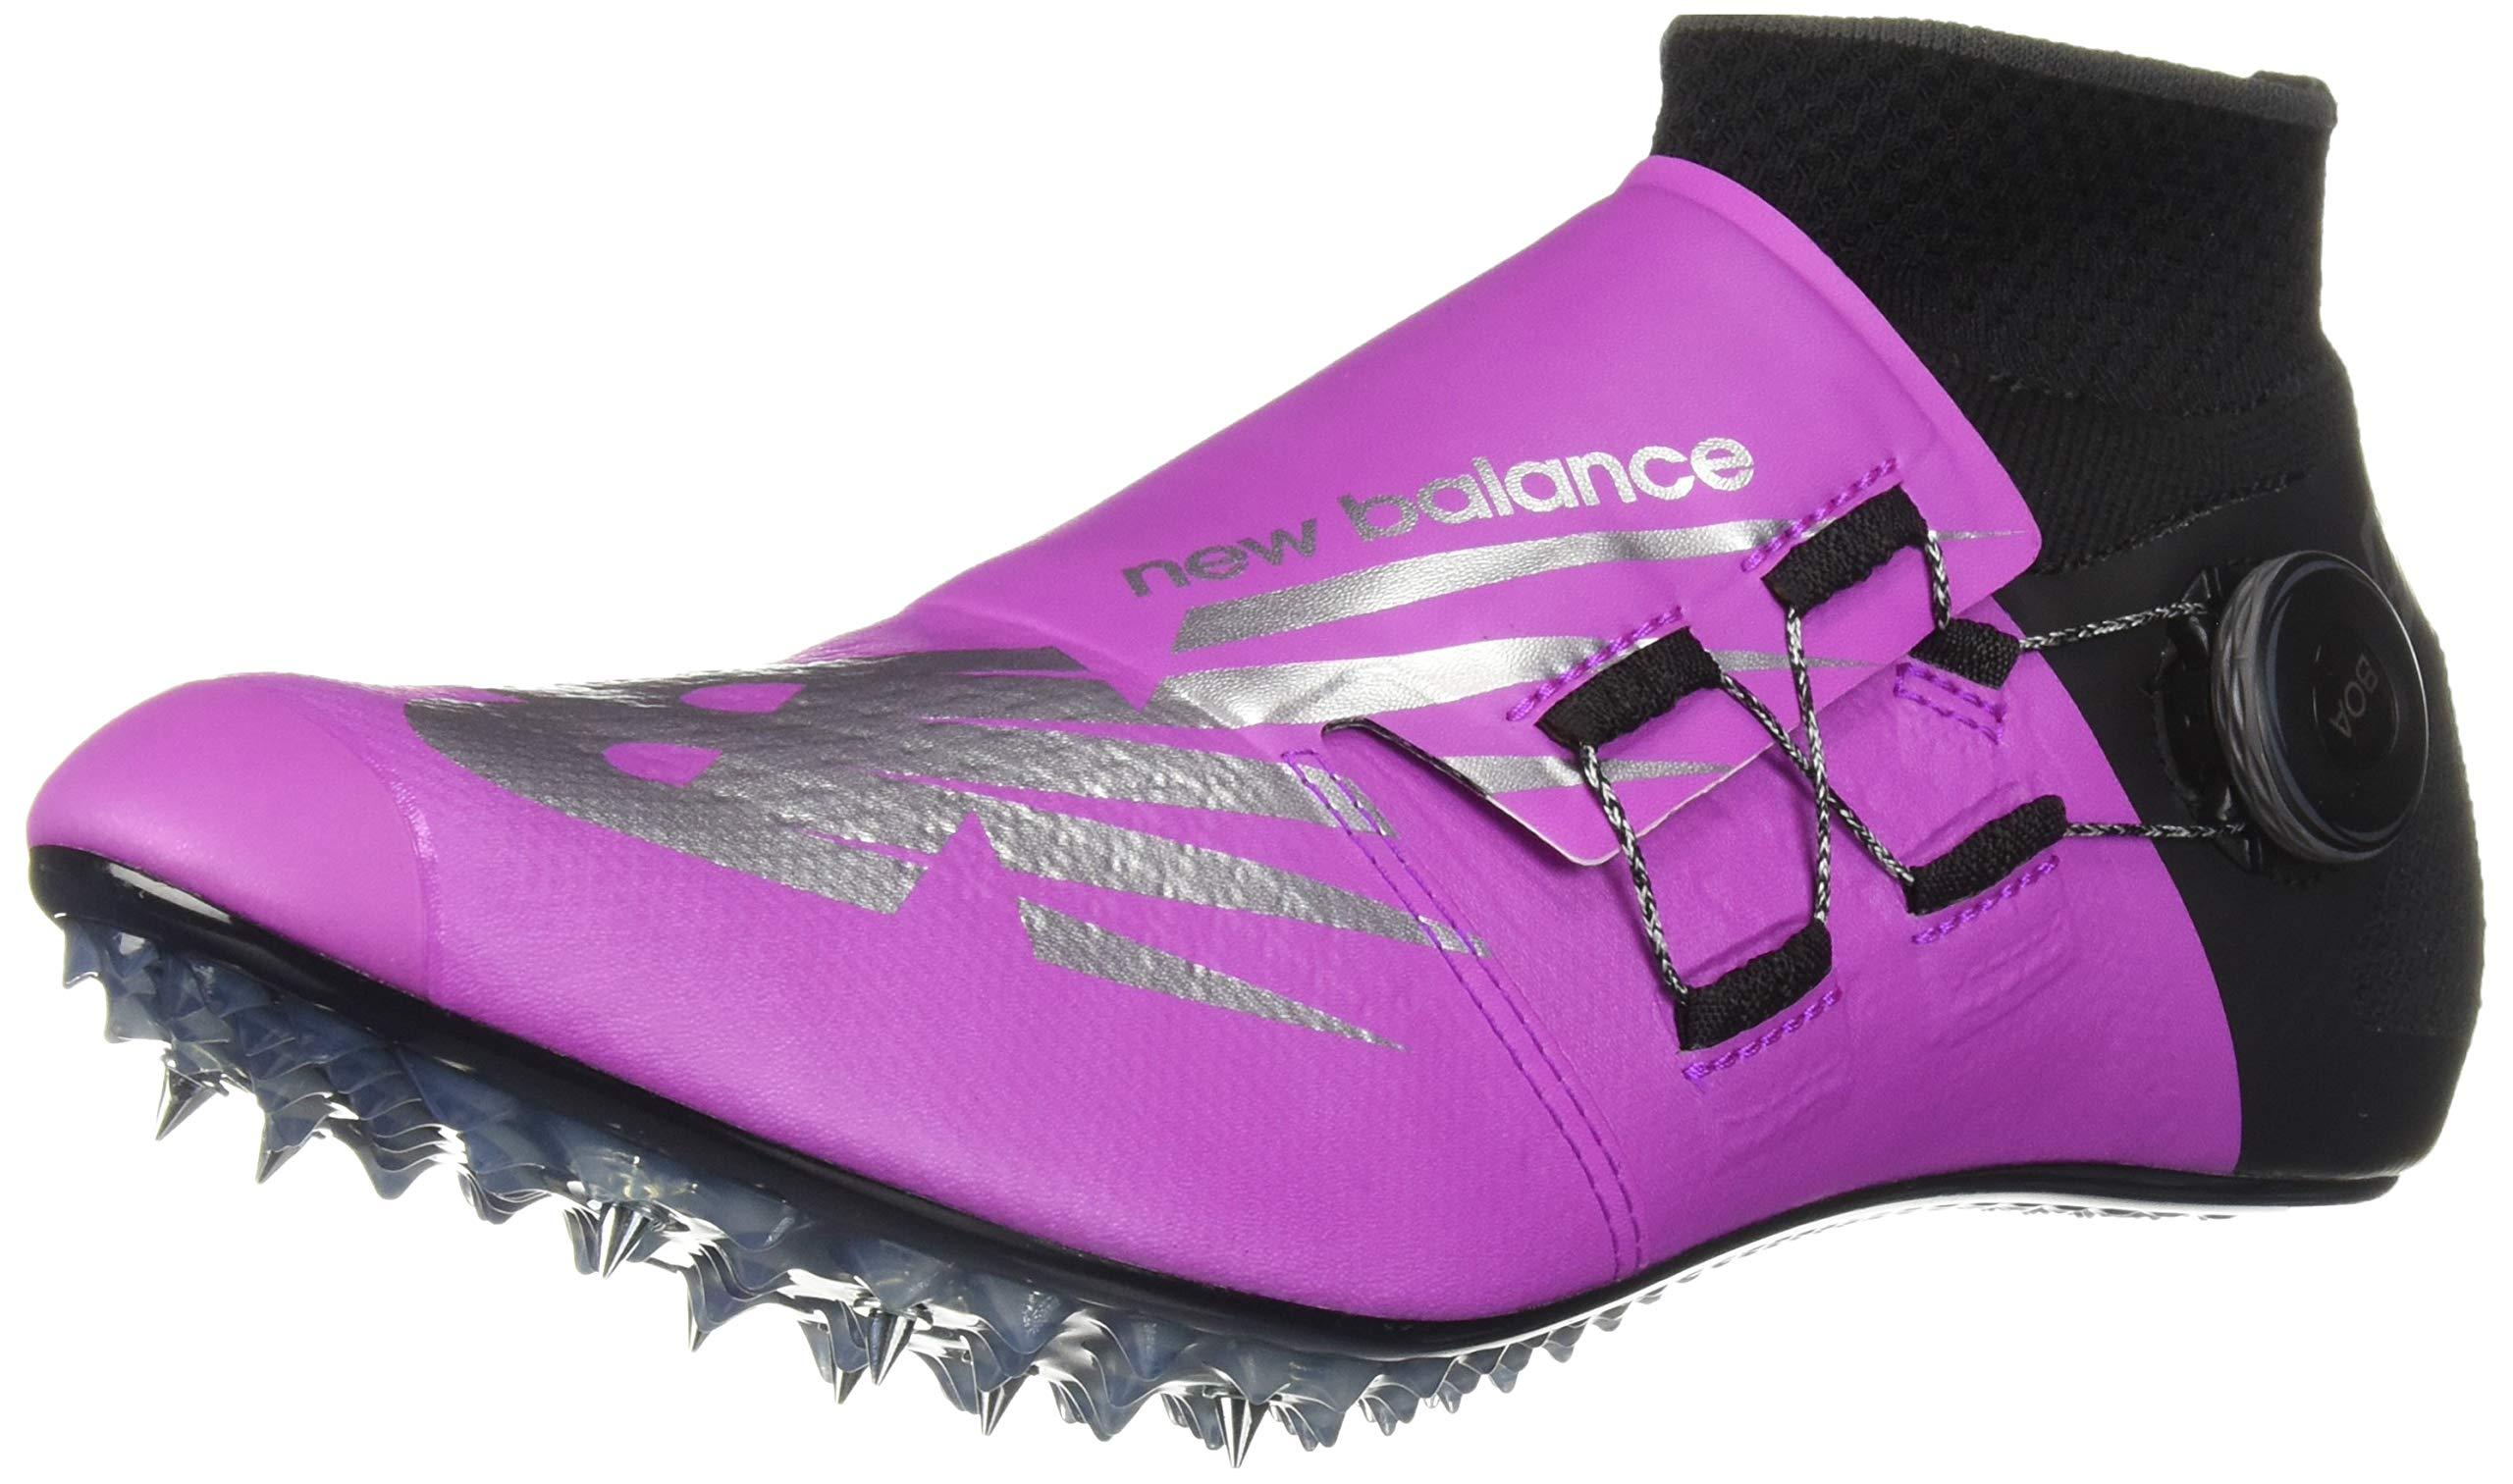 New Balance Men's Sigma Harmony Vazee Track Shoe Voltage Violet/Black 5 D US by New Balance (Image #1)